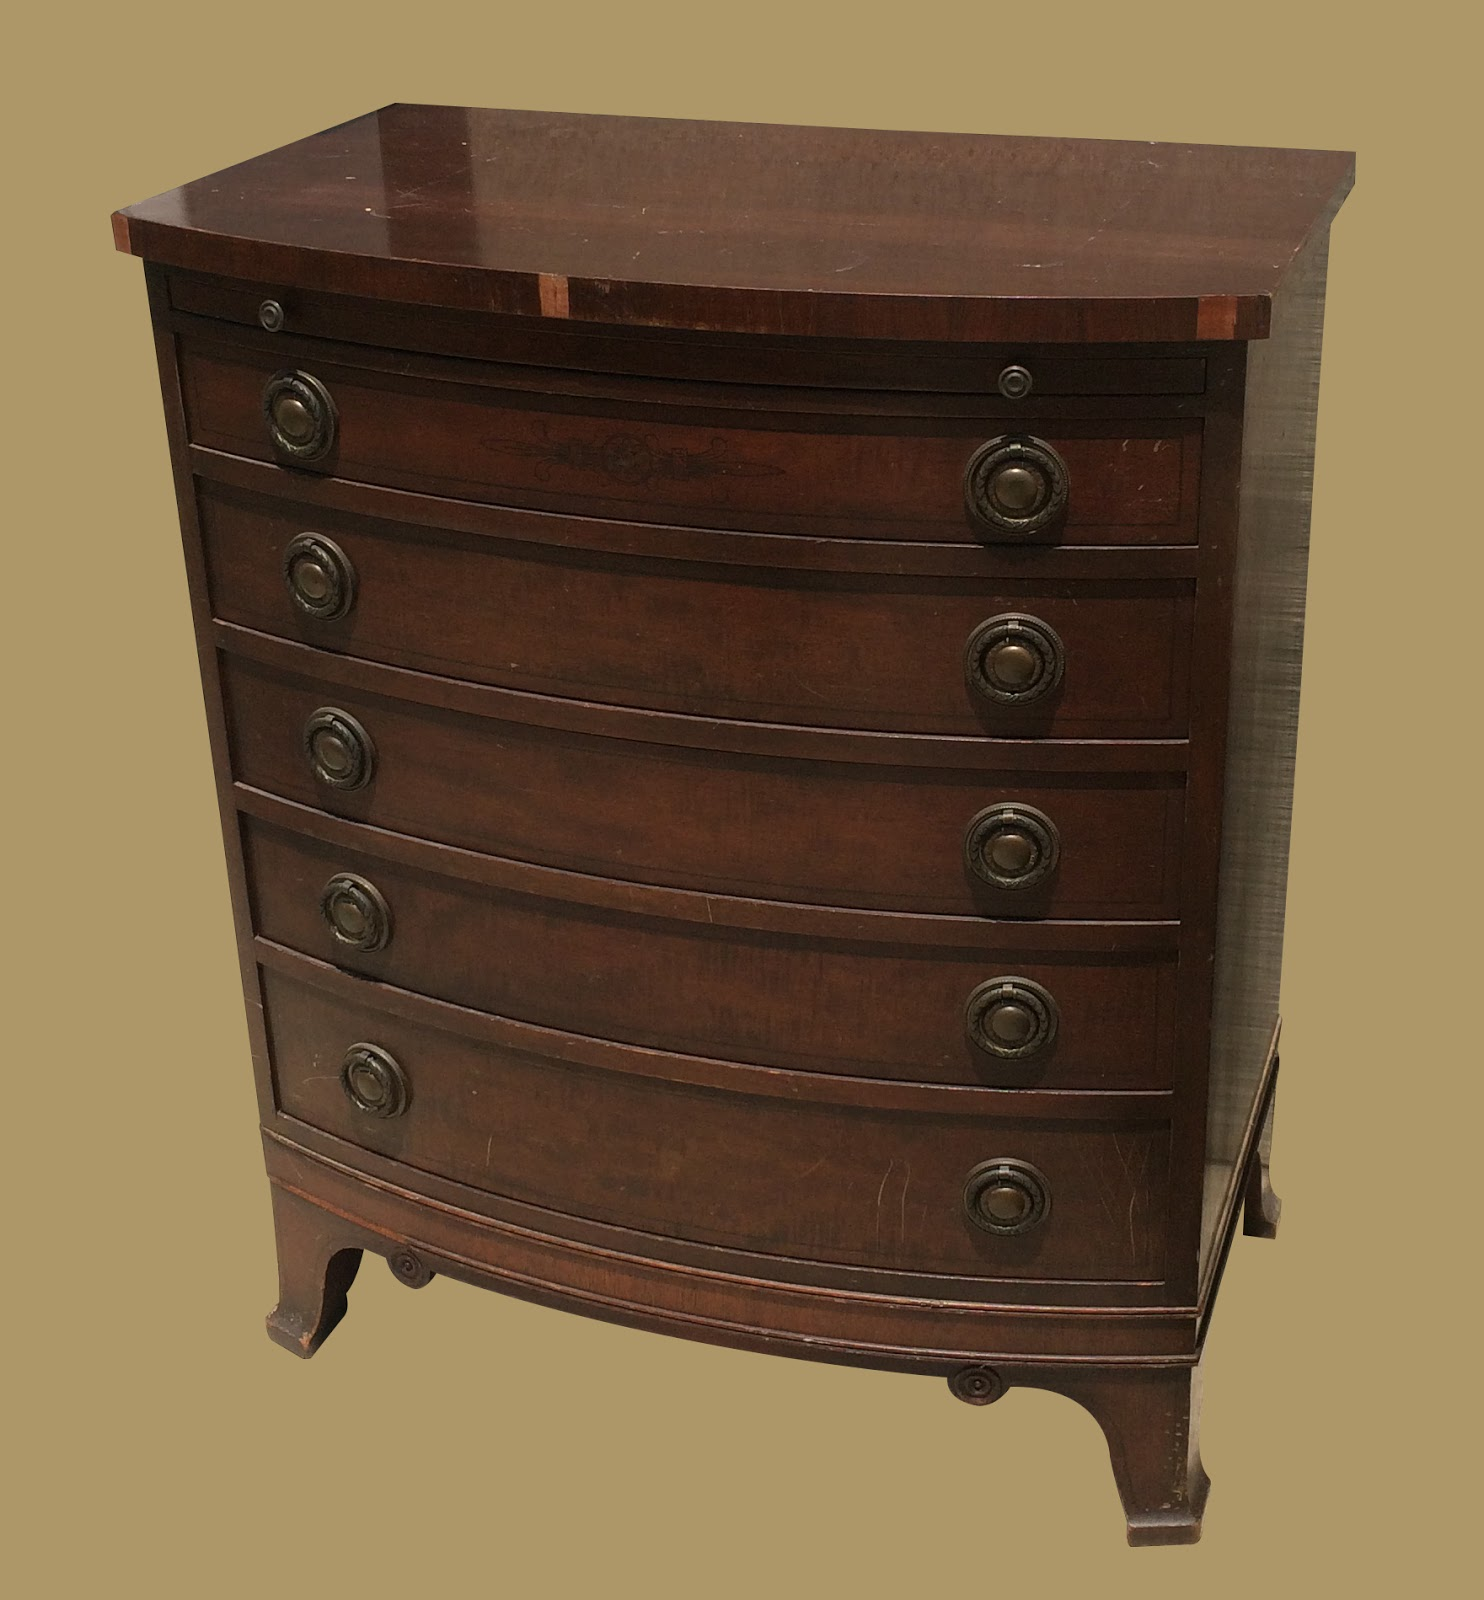 Uhuru Furniture & Collectibles: Vintage Bow-Front Mahogany